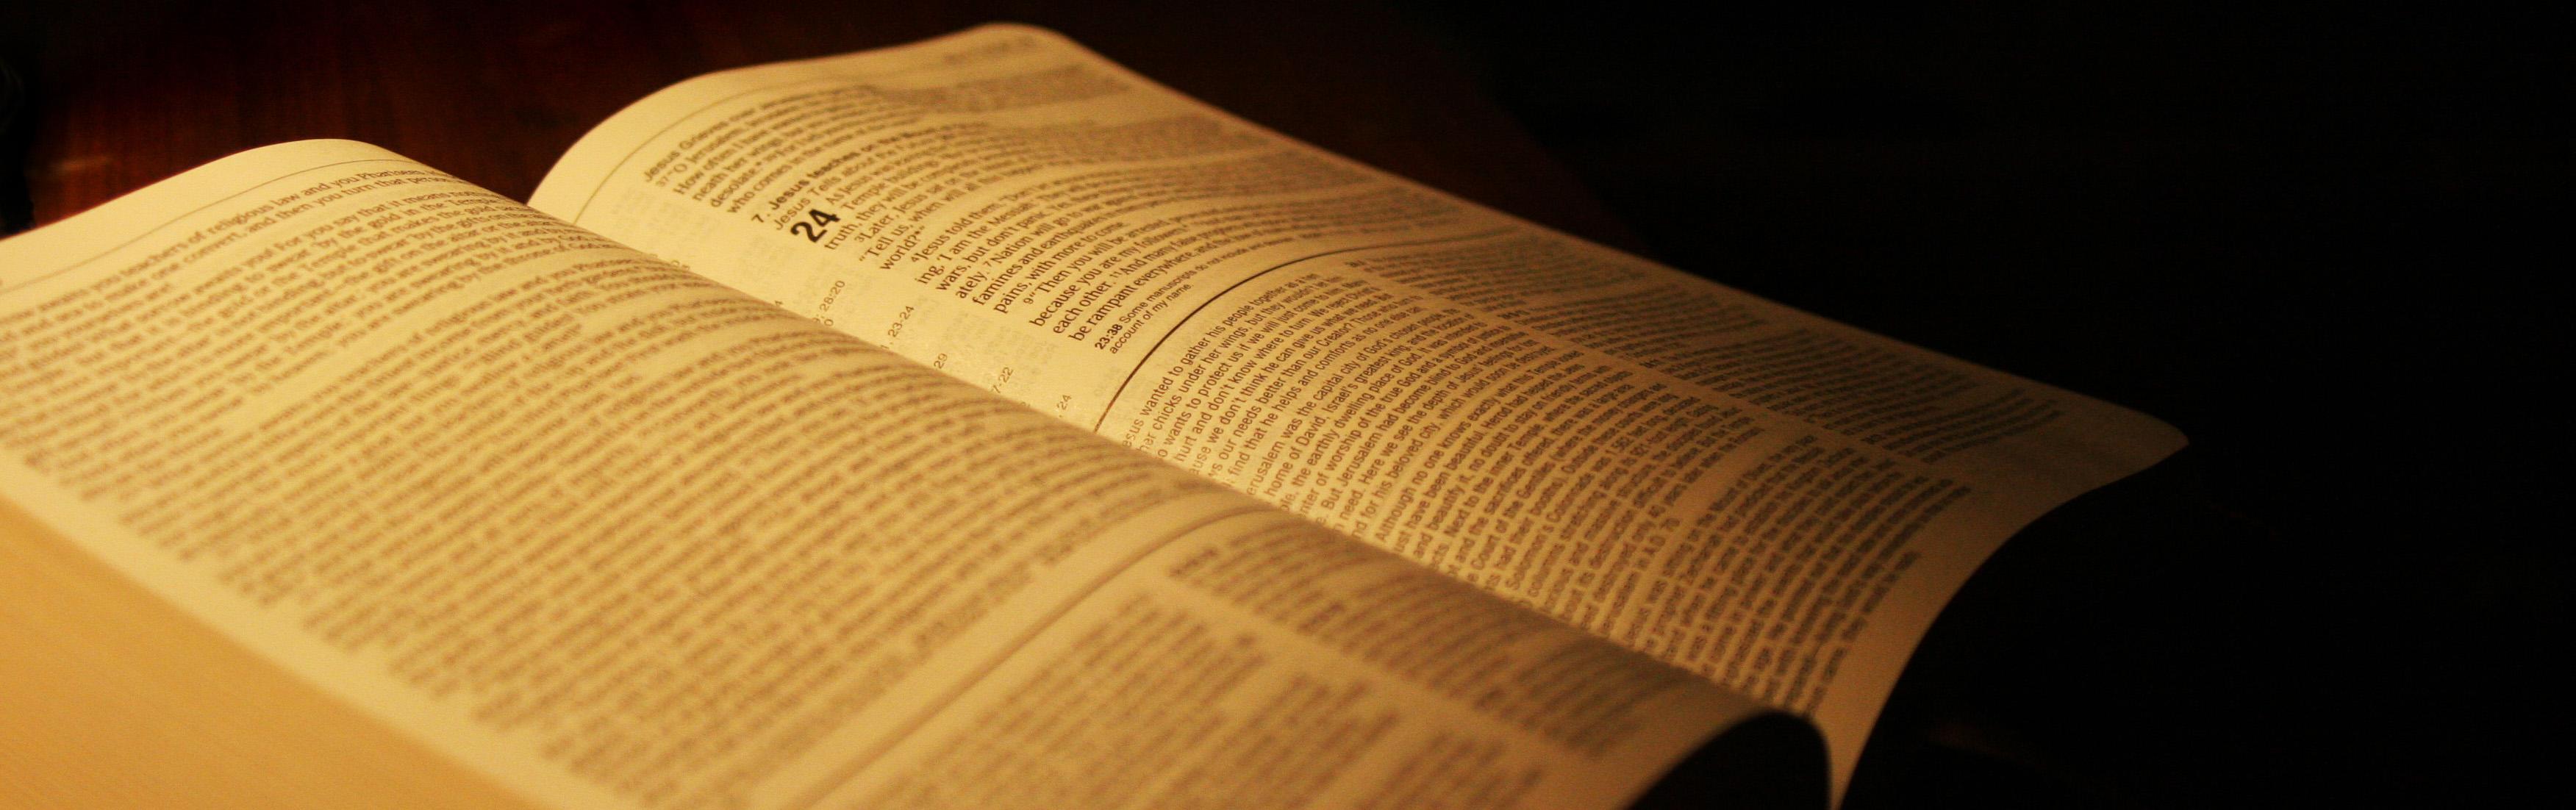 Biblia-Divina